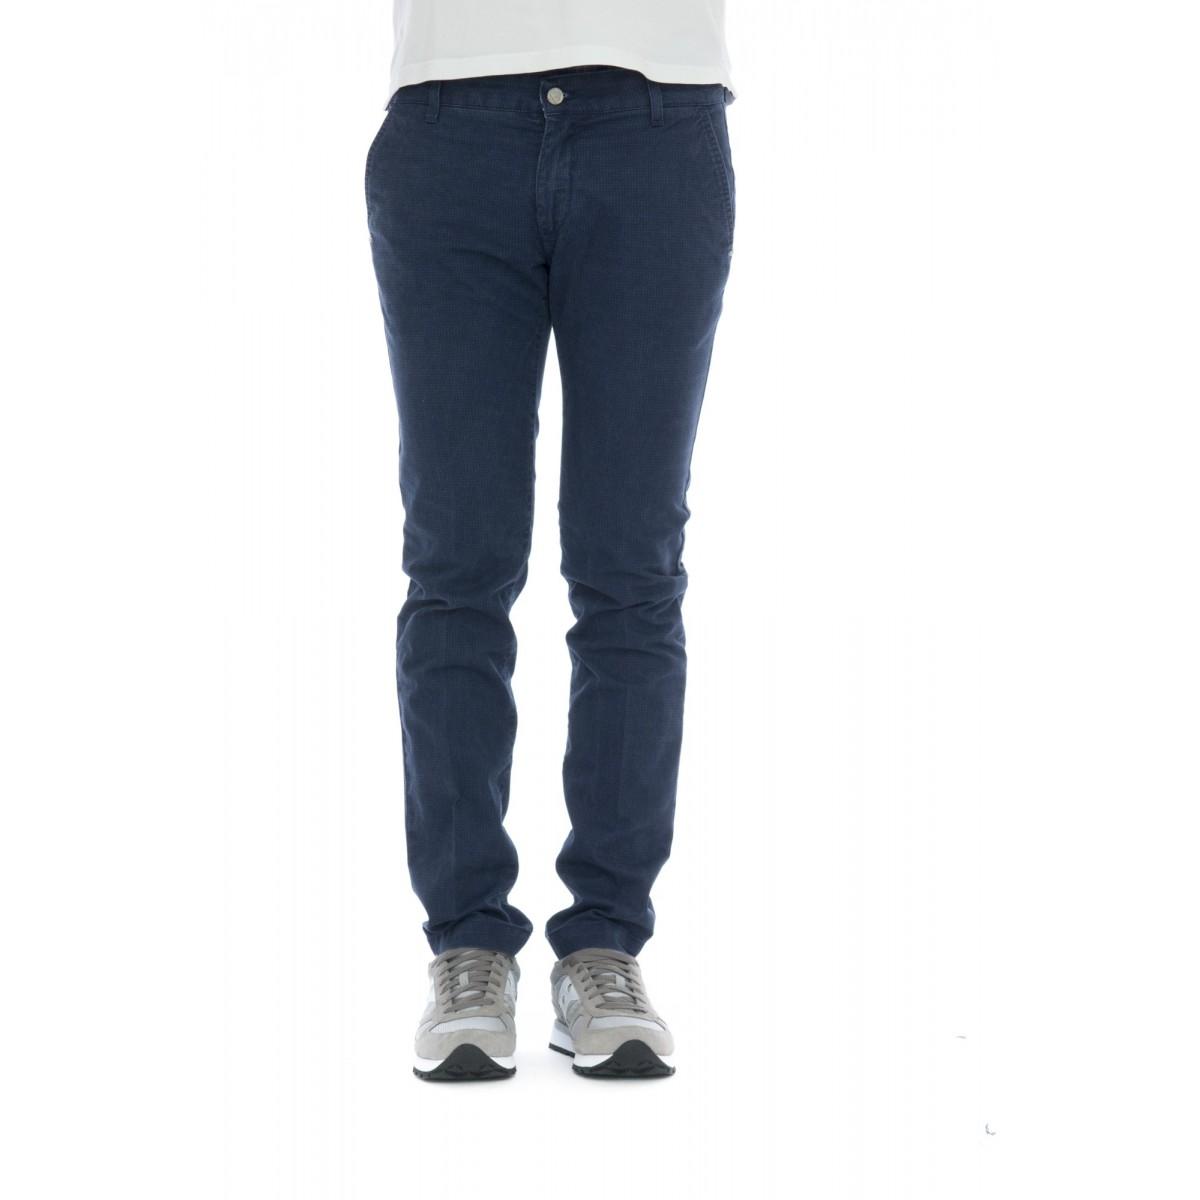 Pantalone uomo - 8344 1037 stampato